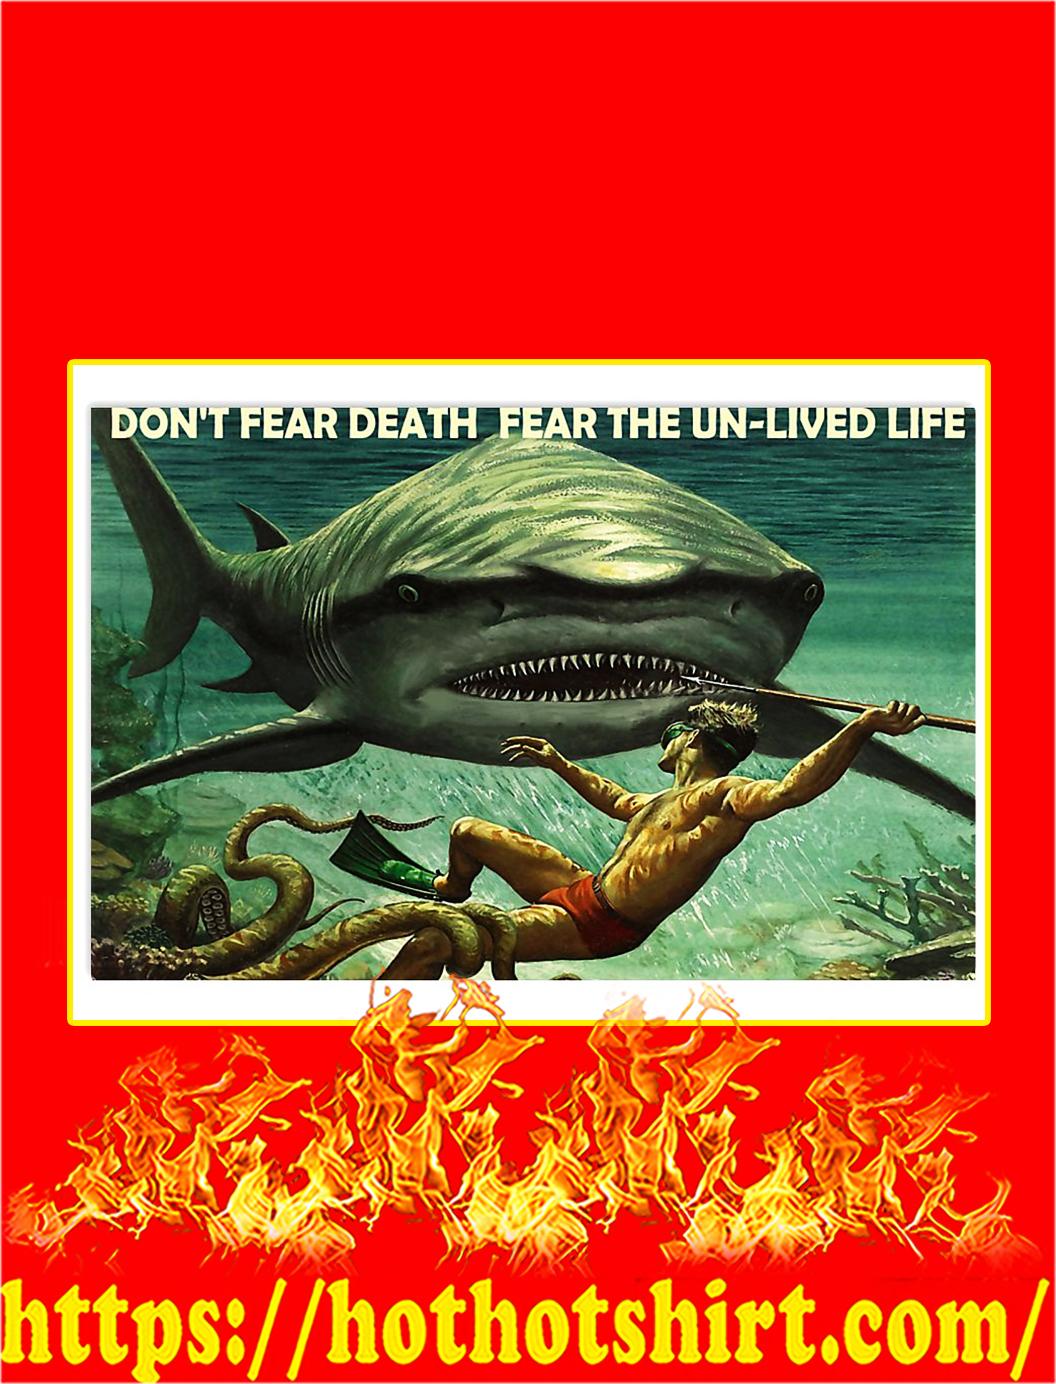 Scuba shark Don't fear death fear the un-lived life poster - A4